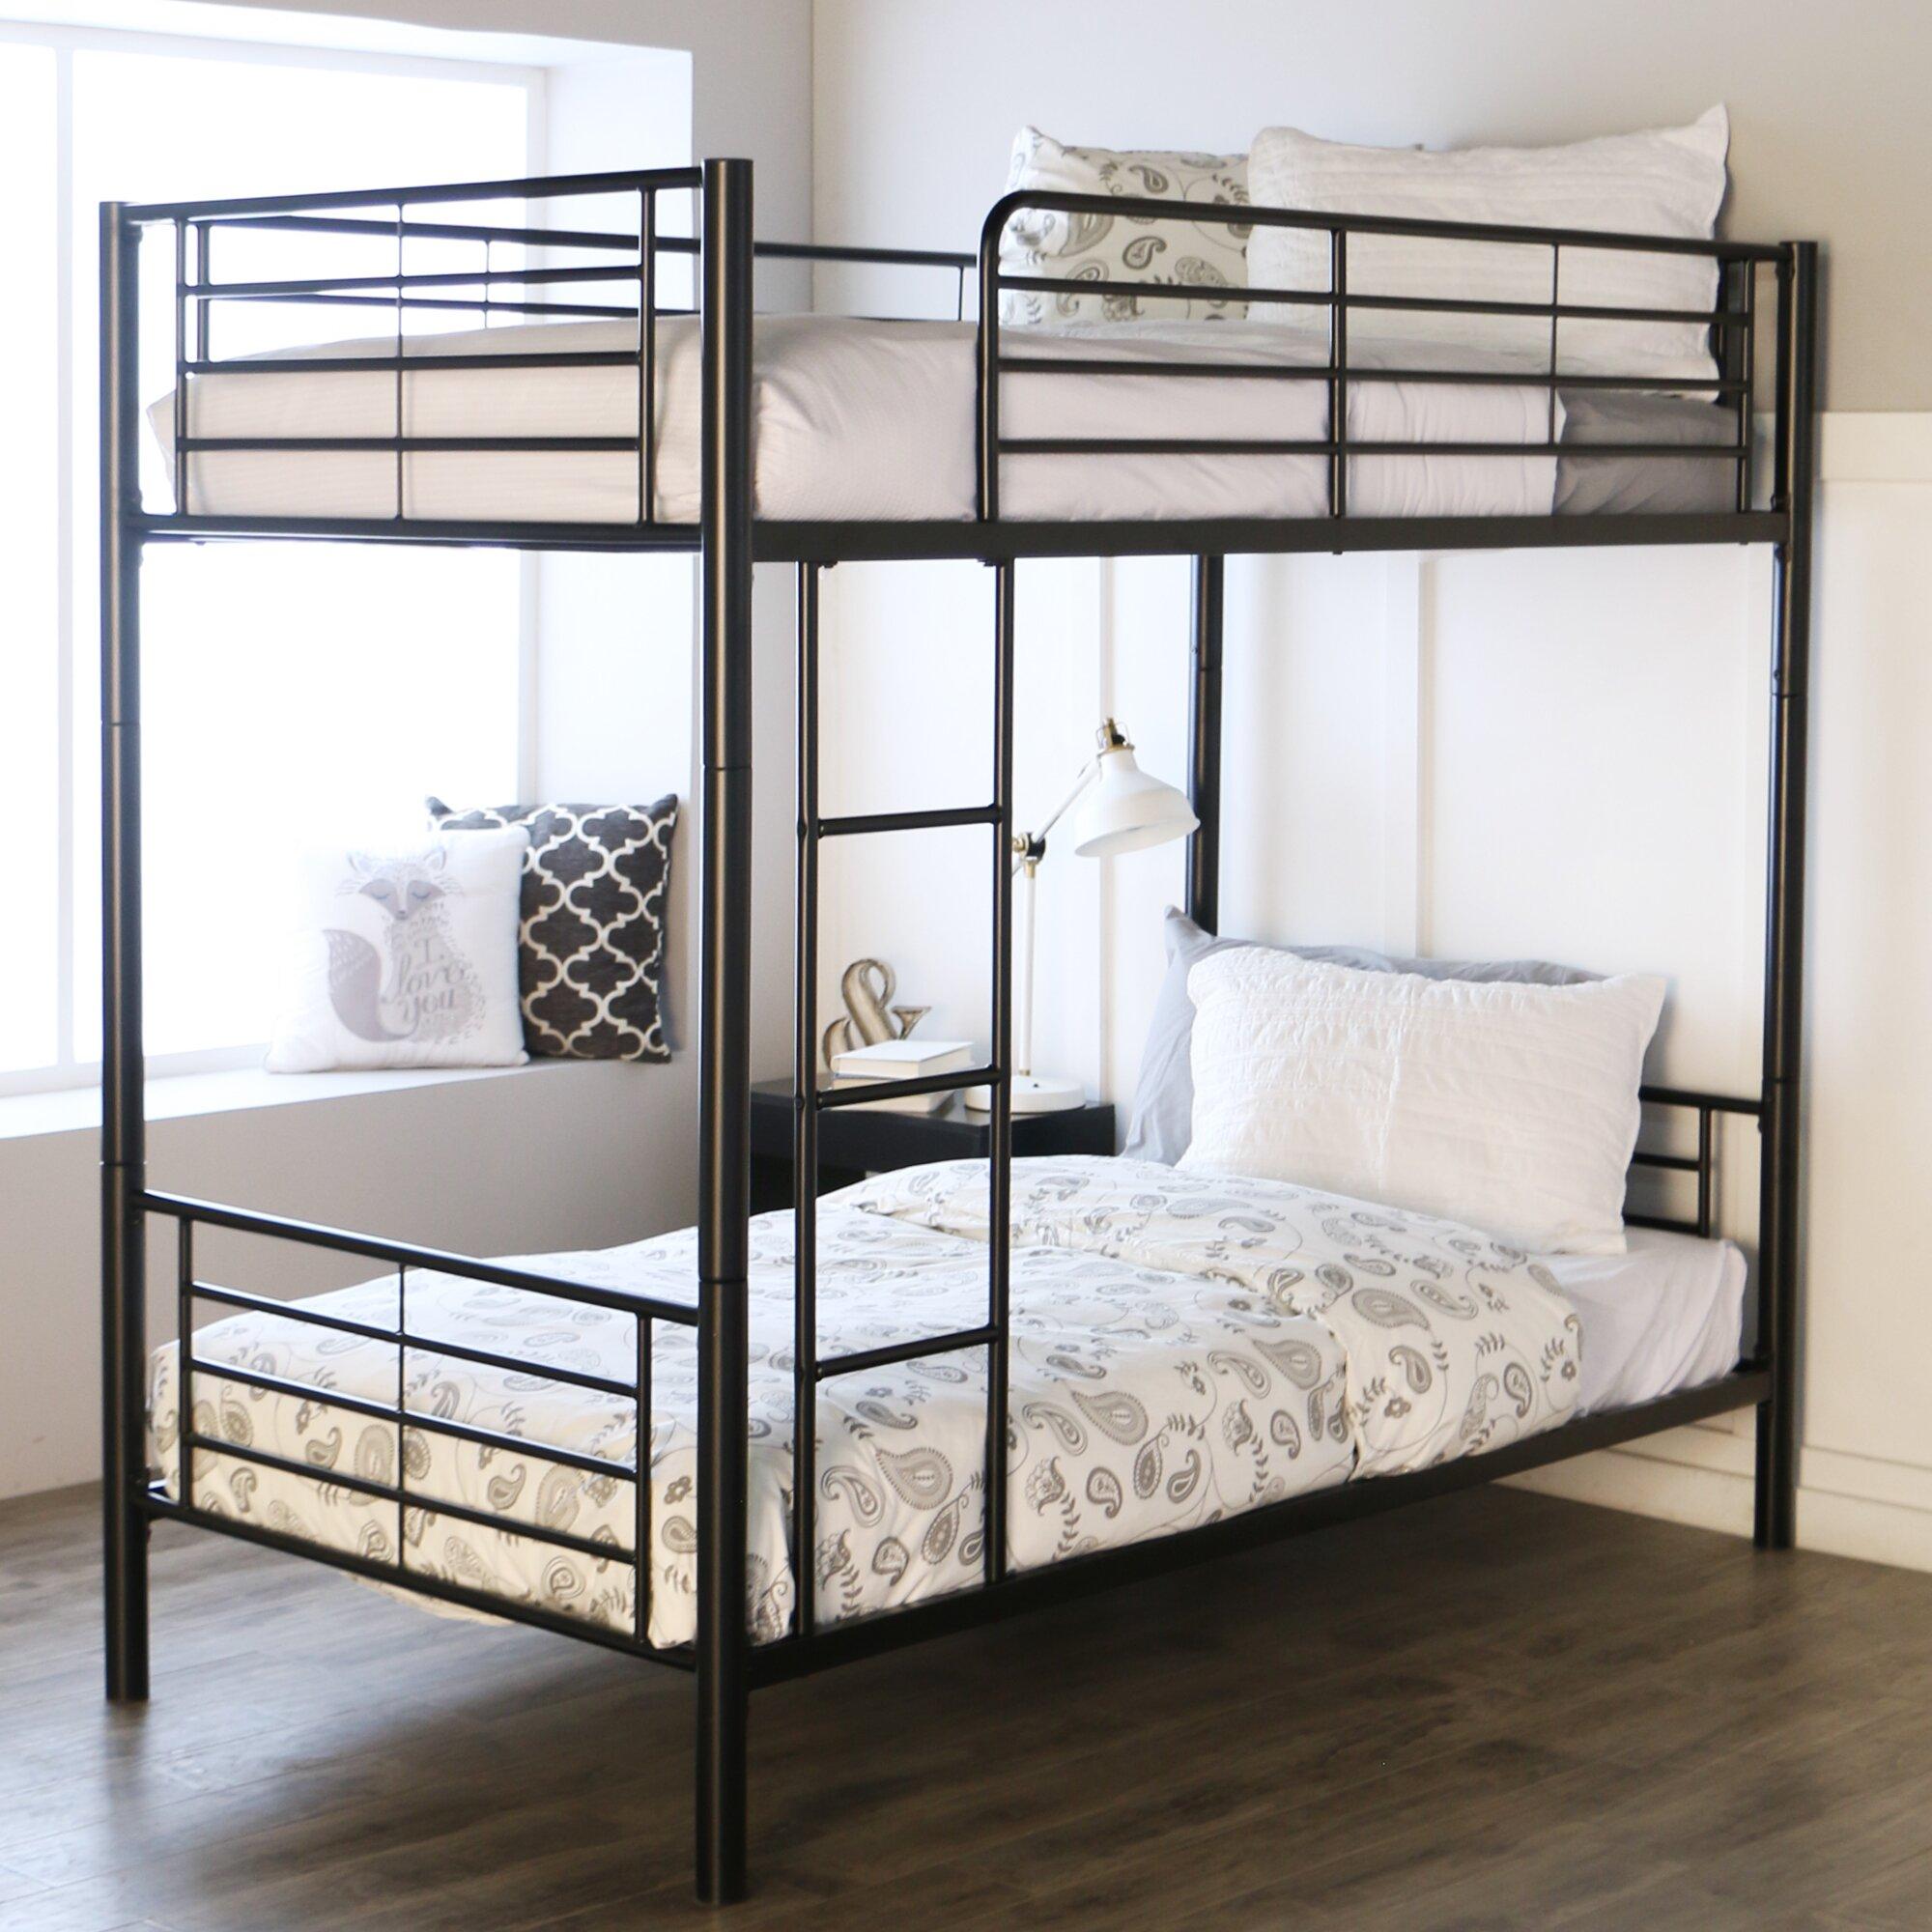 Home loft concepts brady twin bunk bed reviews wayfair for Home loft concept bunk bed